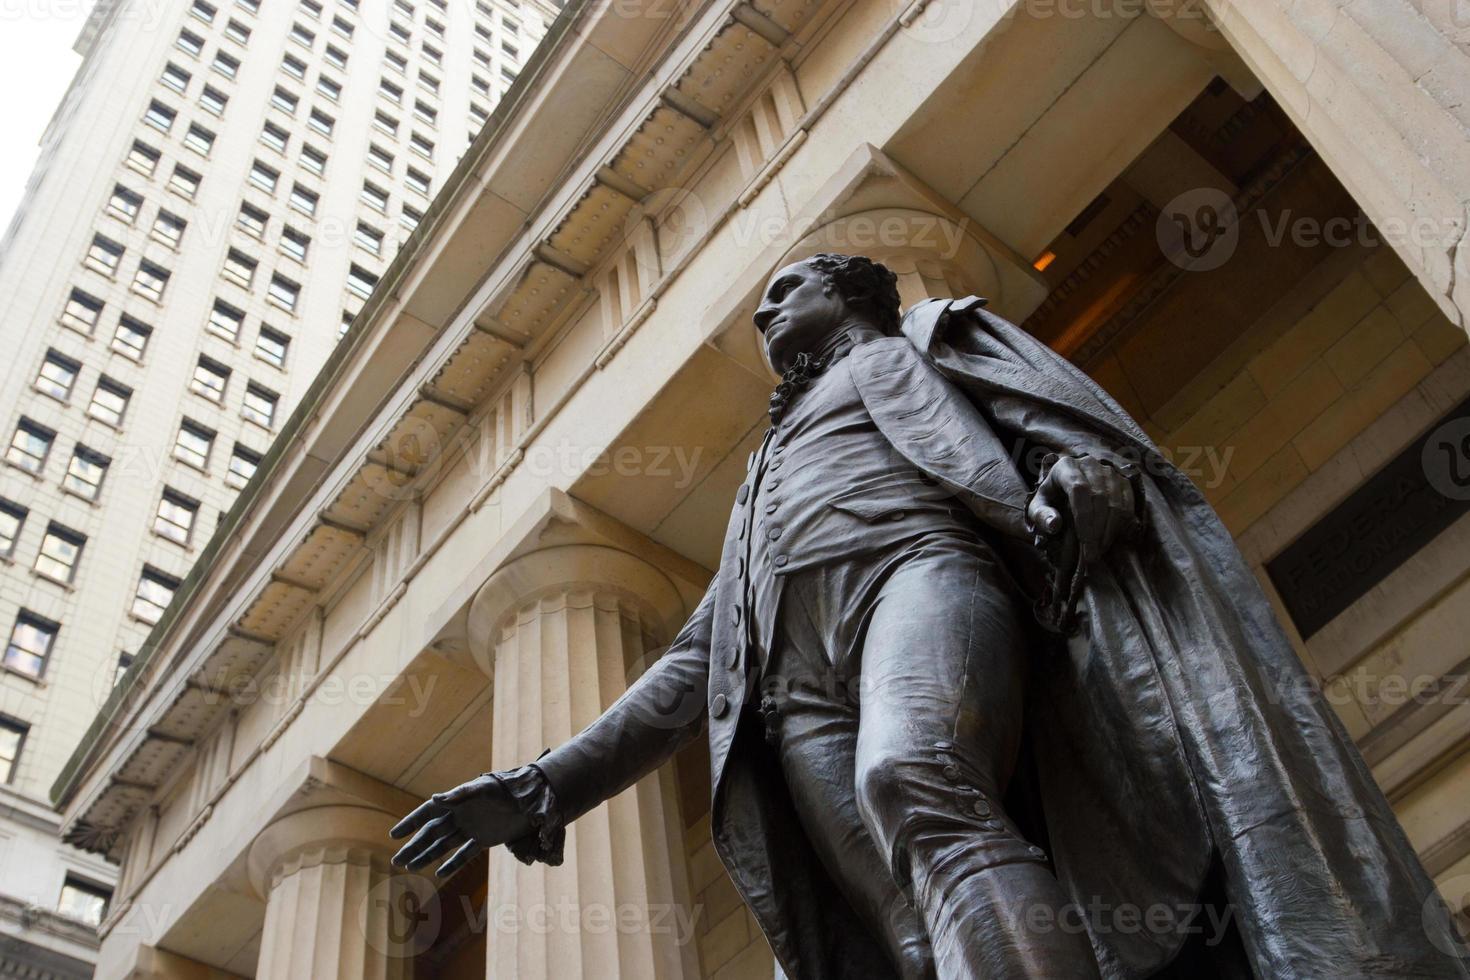 George Washington à la salle fédérale sur Wall Street, NY photo